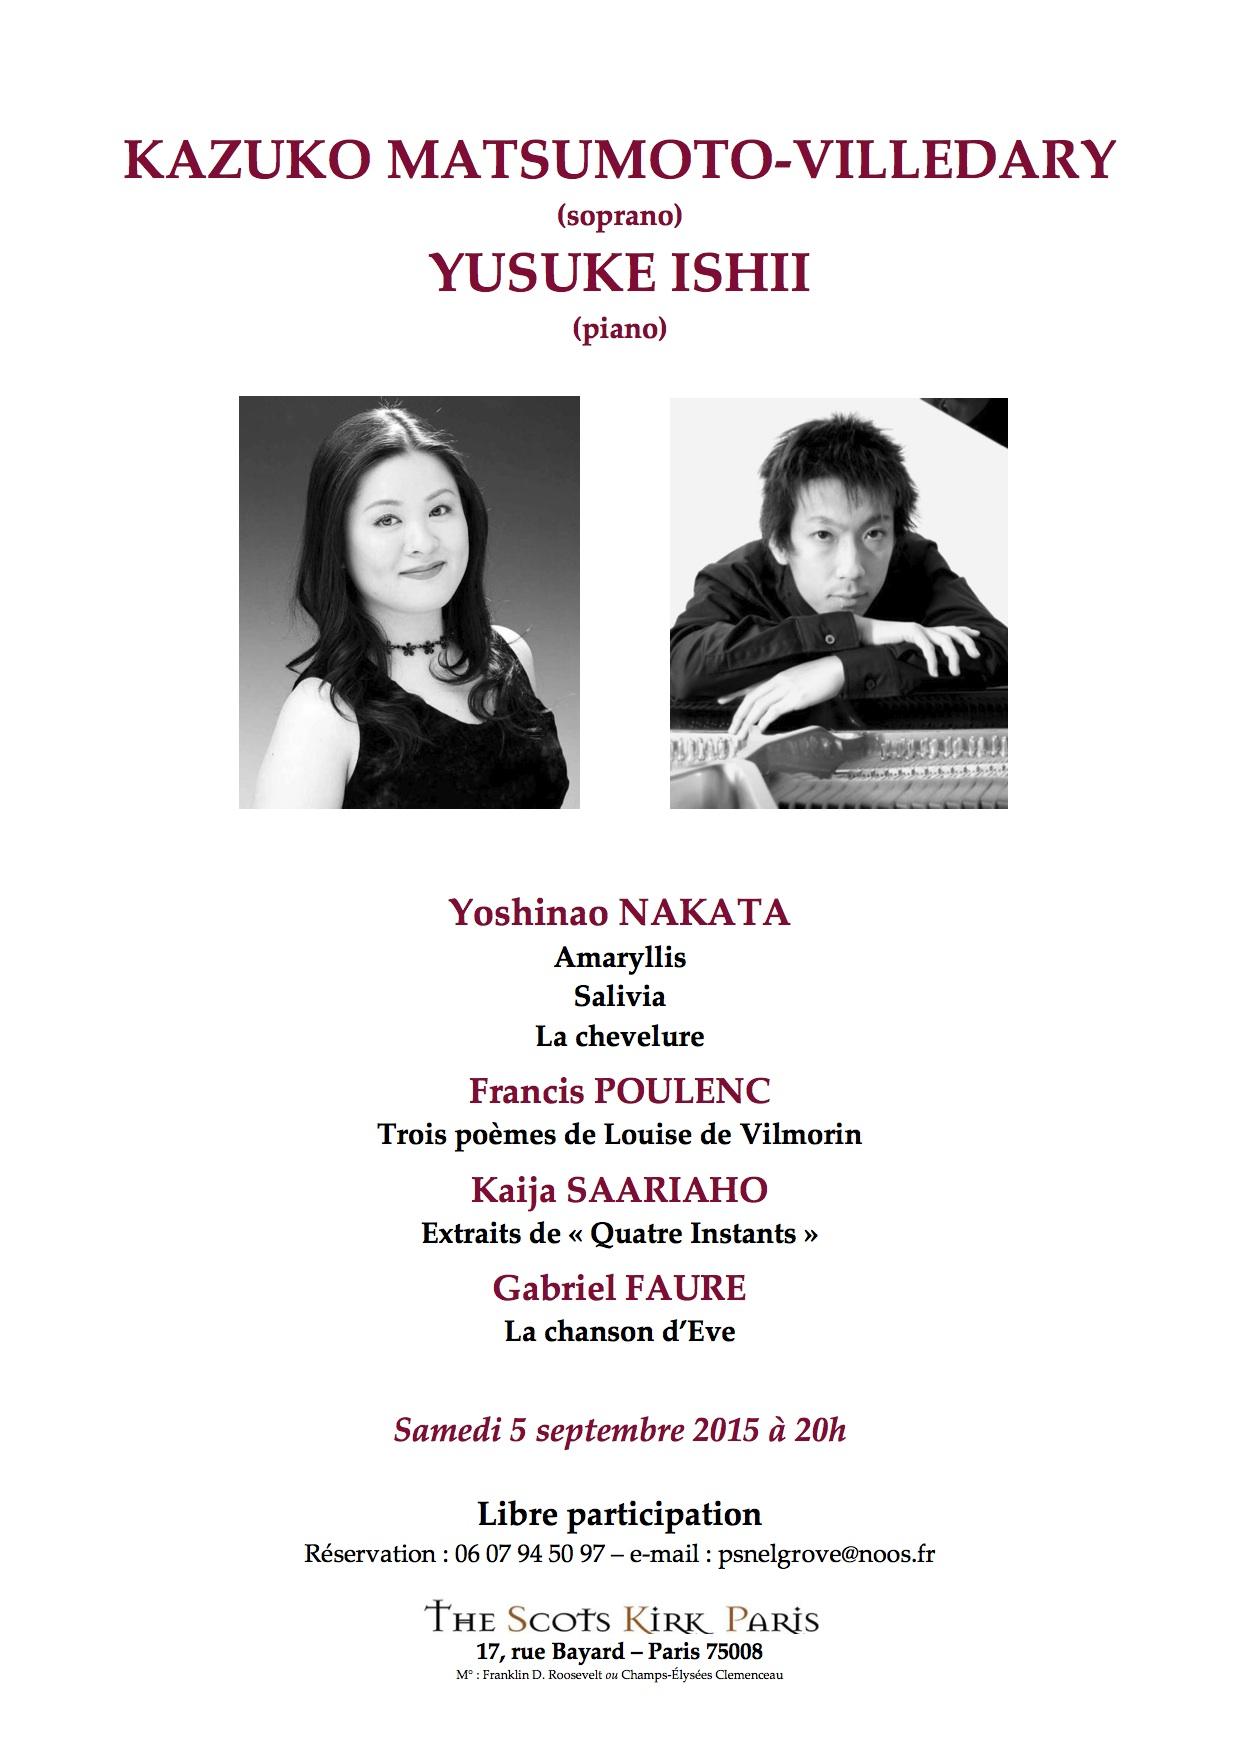 concert 5 septembre 2015